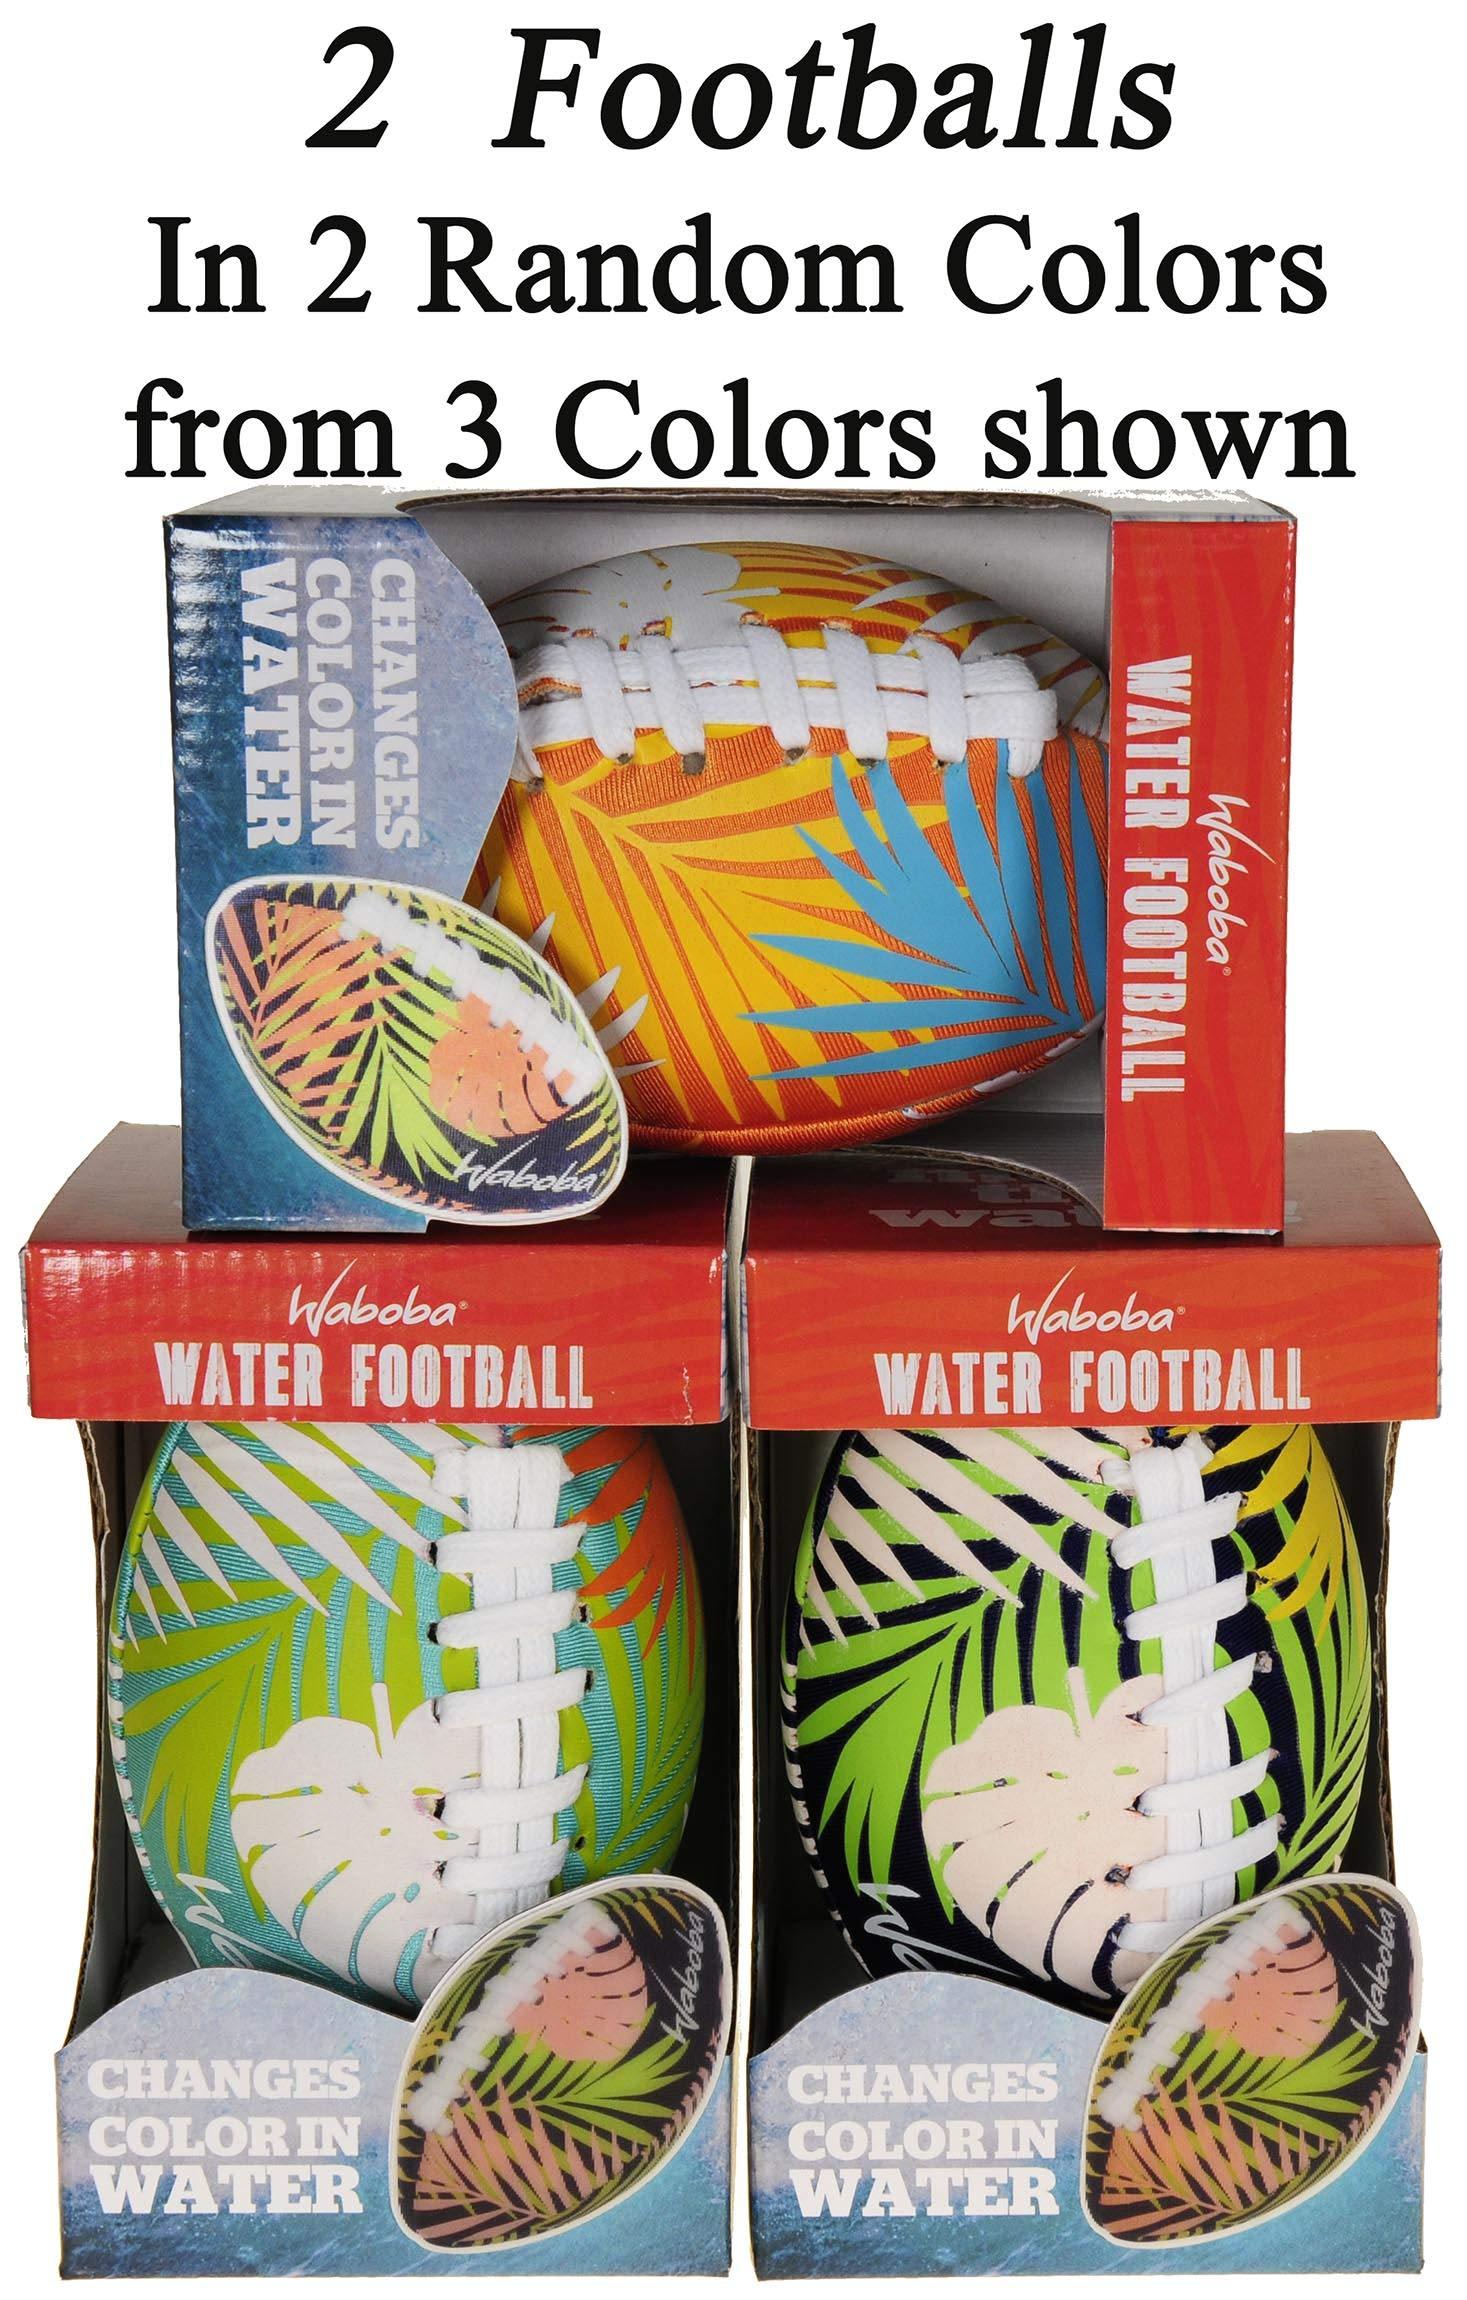 Waboba Color Changing Water Football 6'' // Bundle of 2 Footballs (Random Colors) // Bonus Blue Nylon Mesh Carry Bag// Bundled Items by Waboba (Image #5)